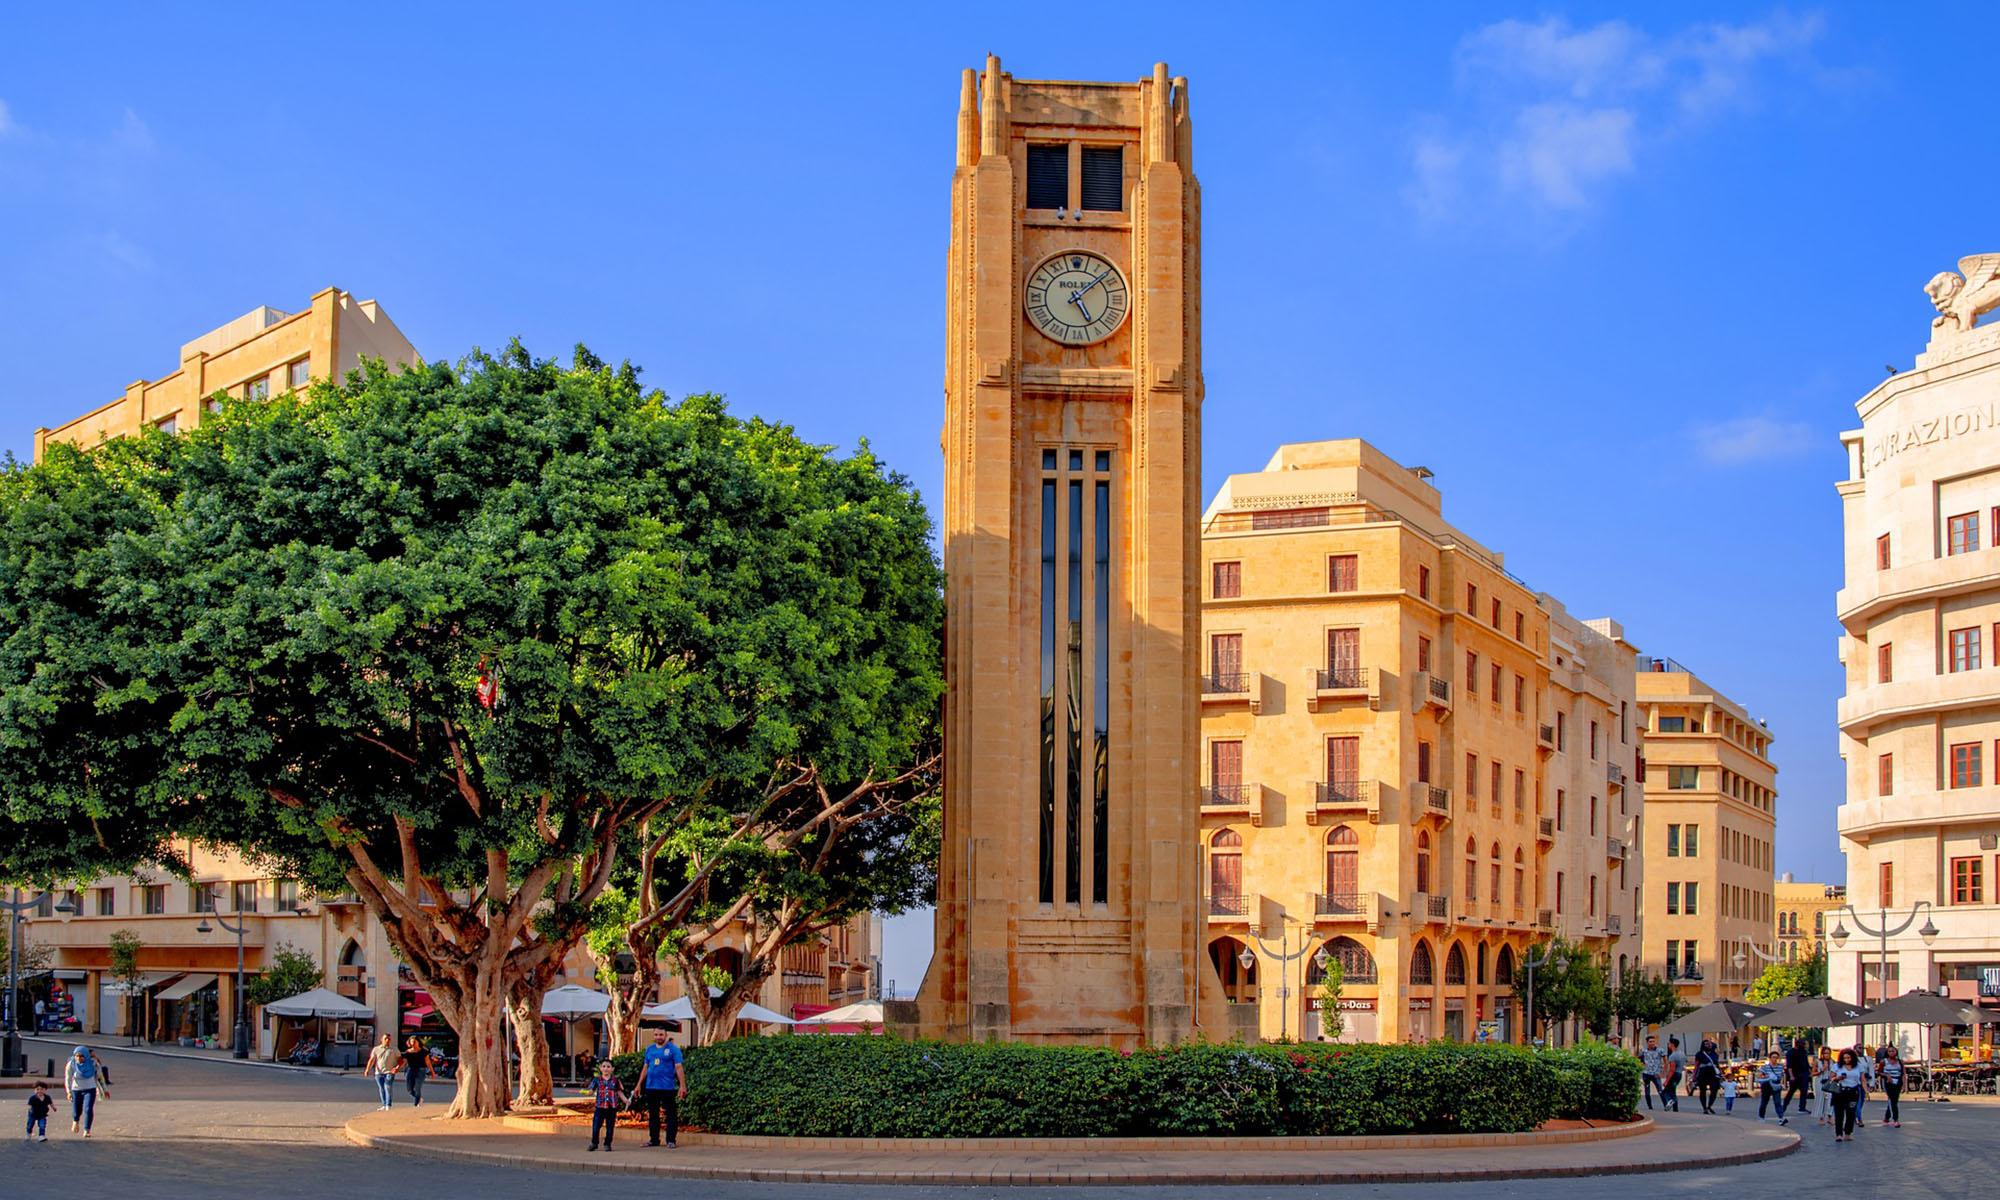 Libanon Beiroet Klokkentoren Place De L Etoile